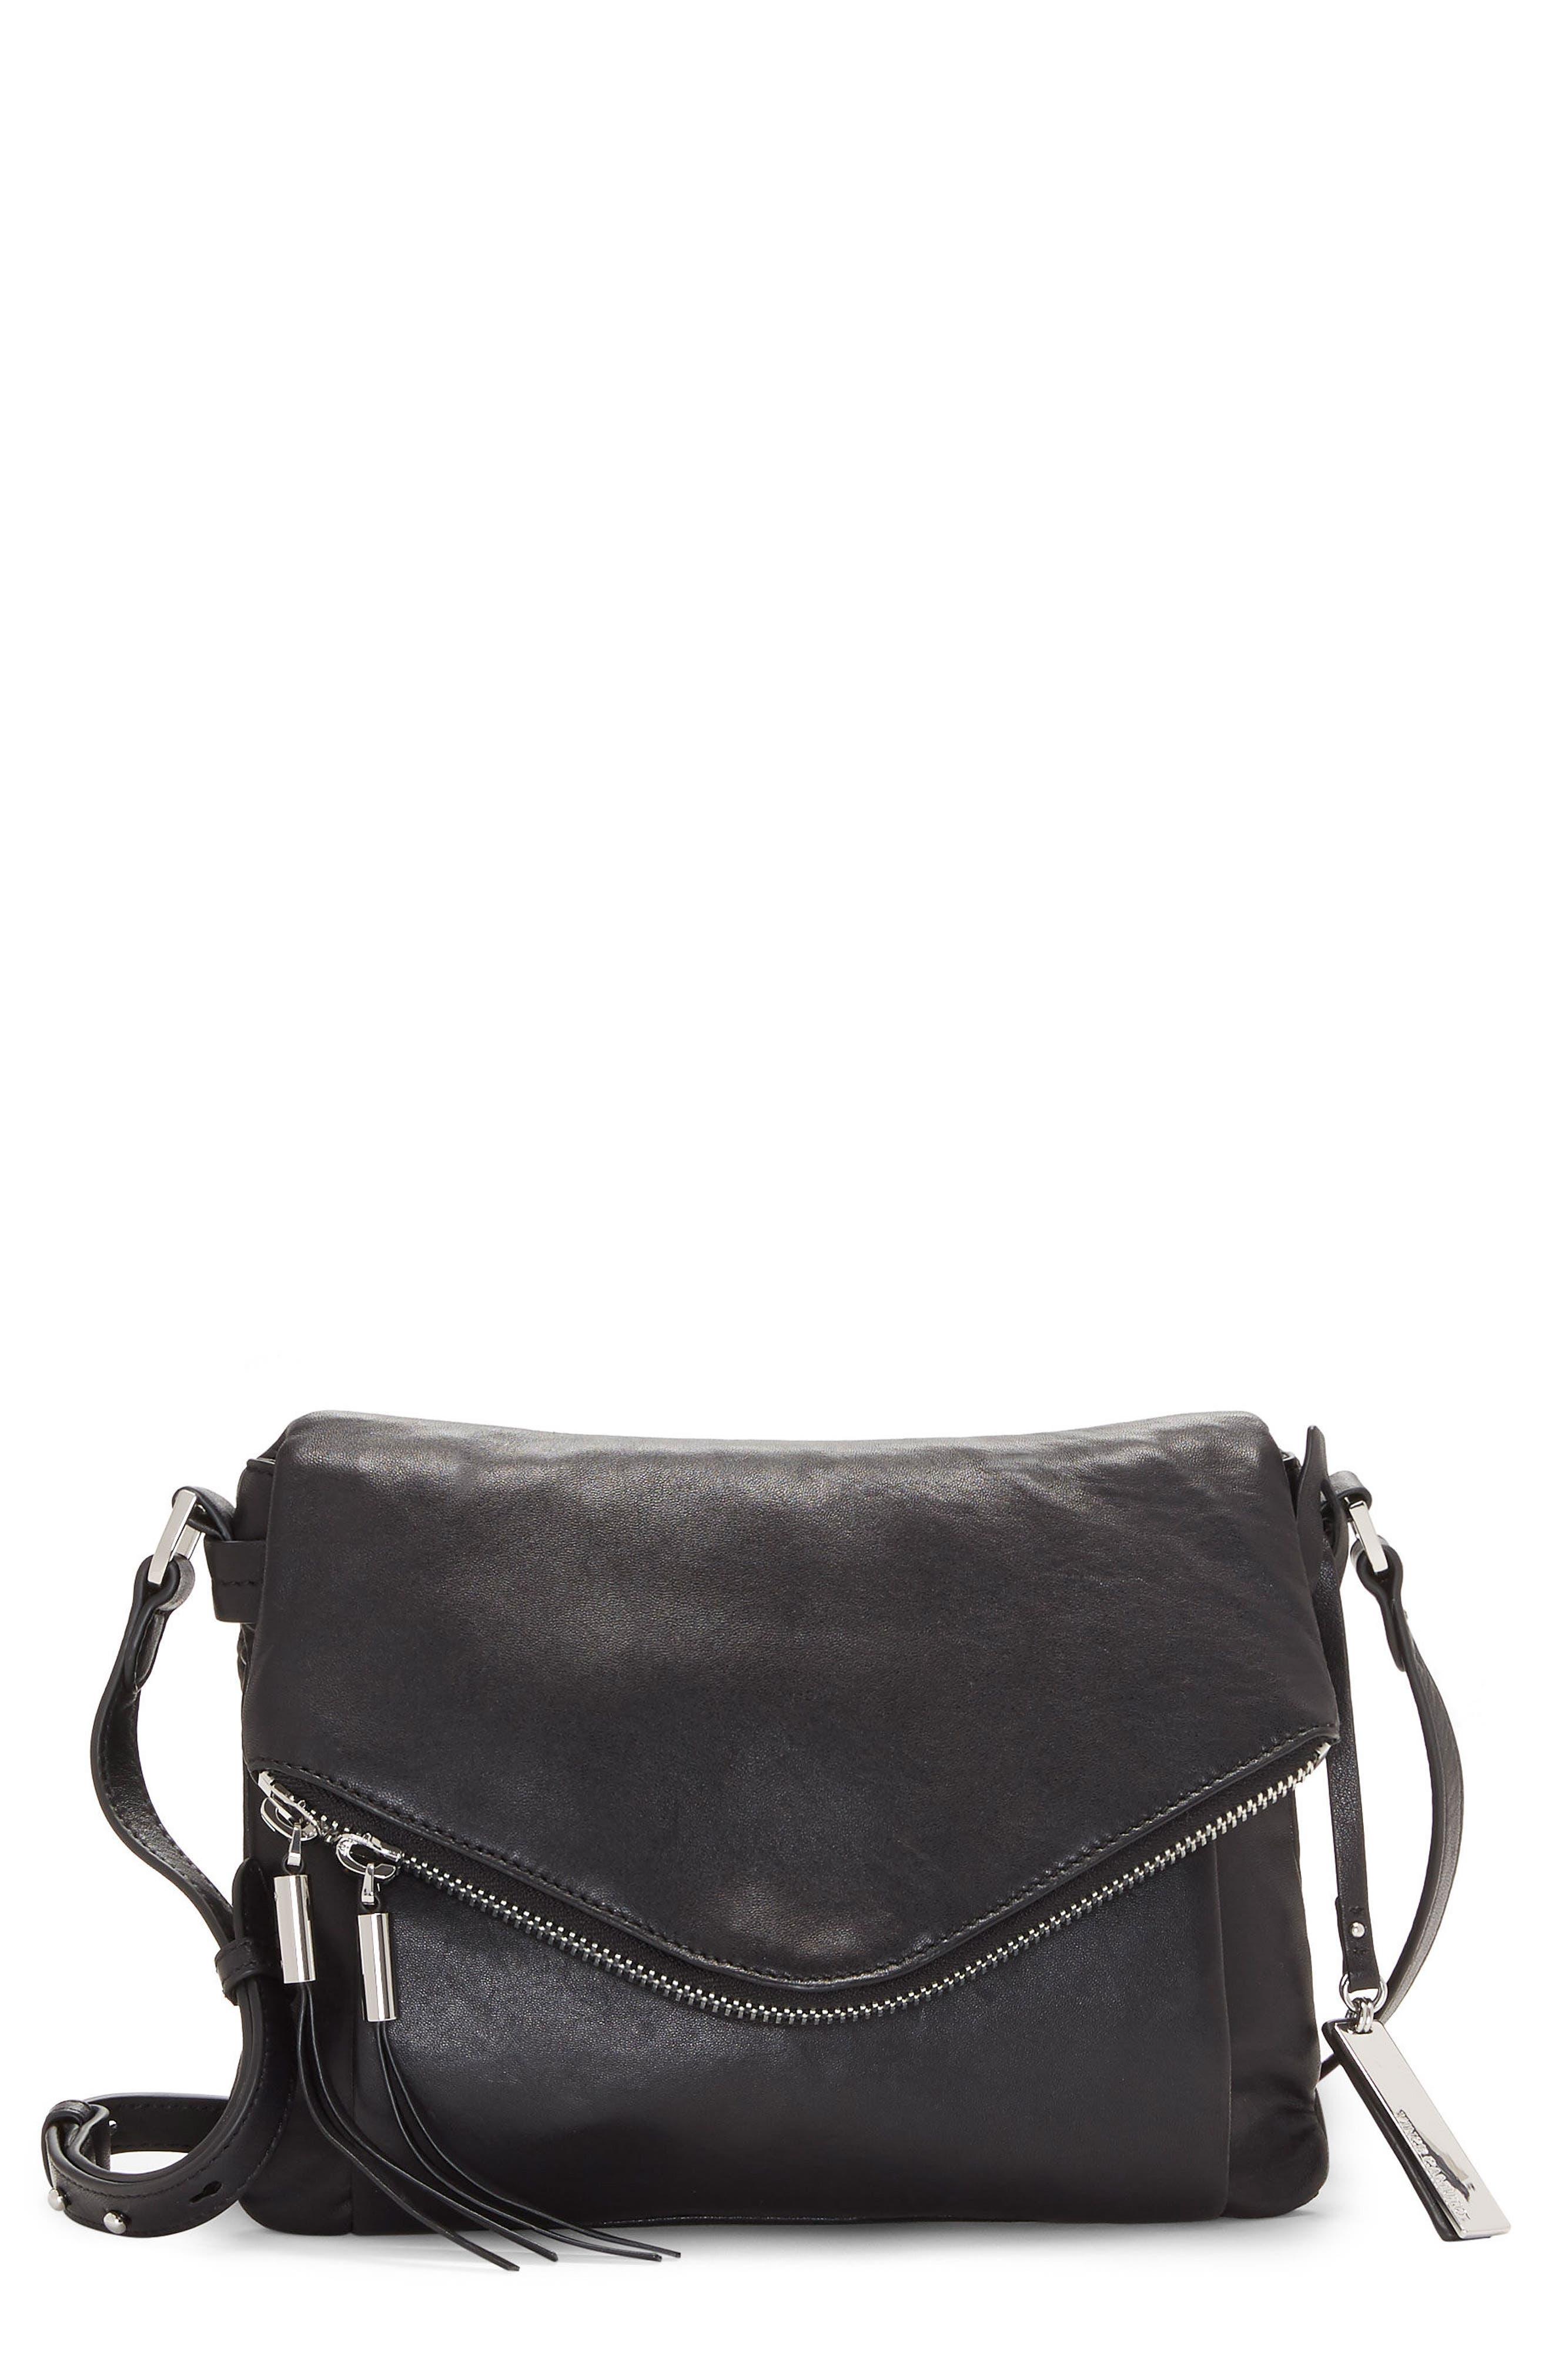 Alder Leather Crossbody Bag,                             Main thumbnail 1, color,                             Nero